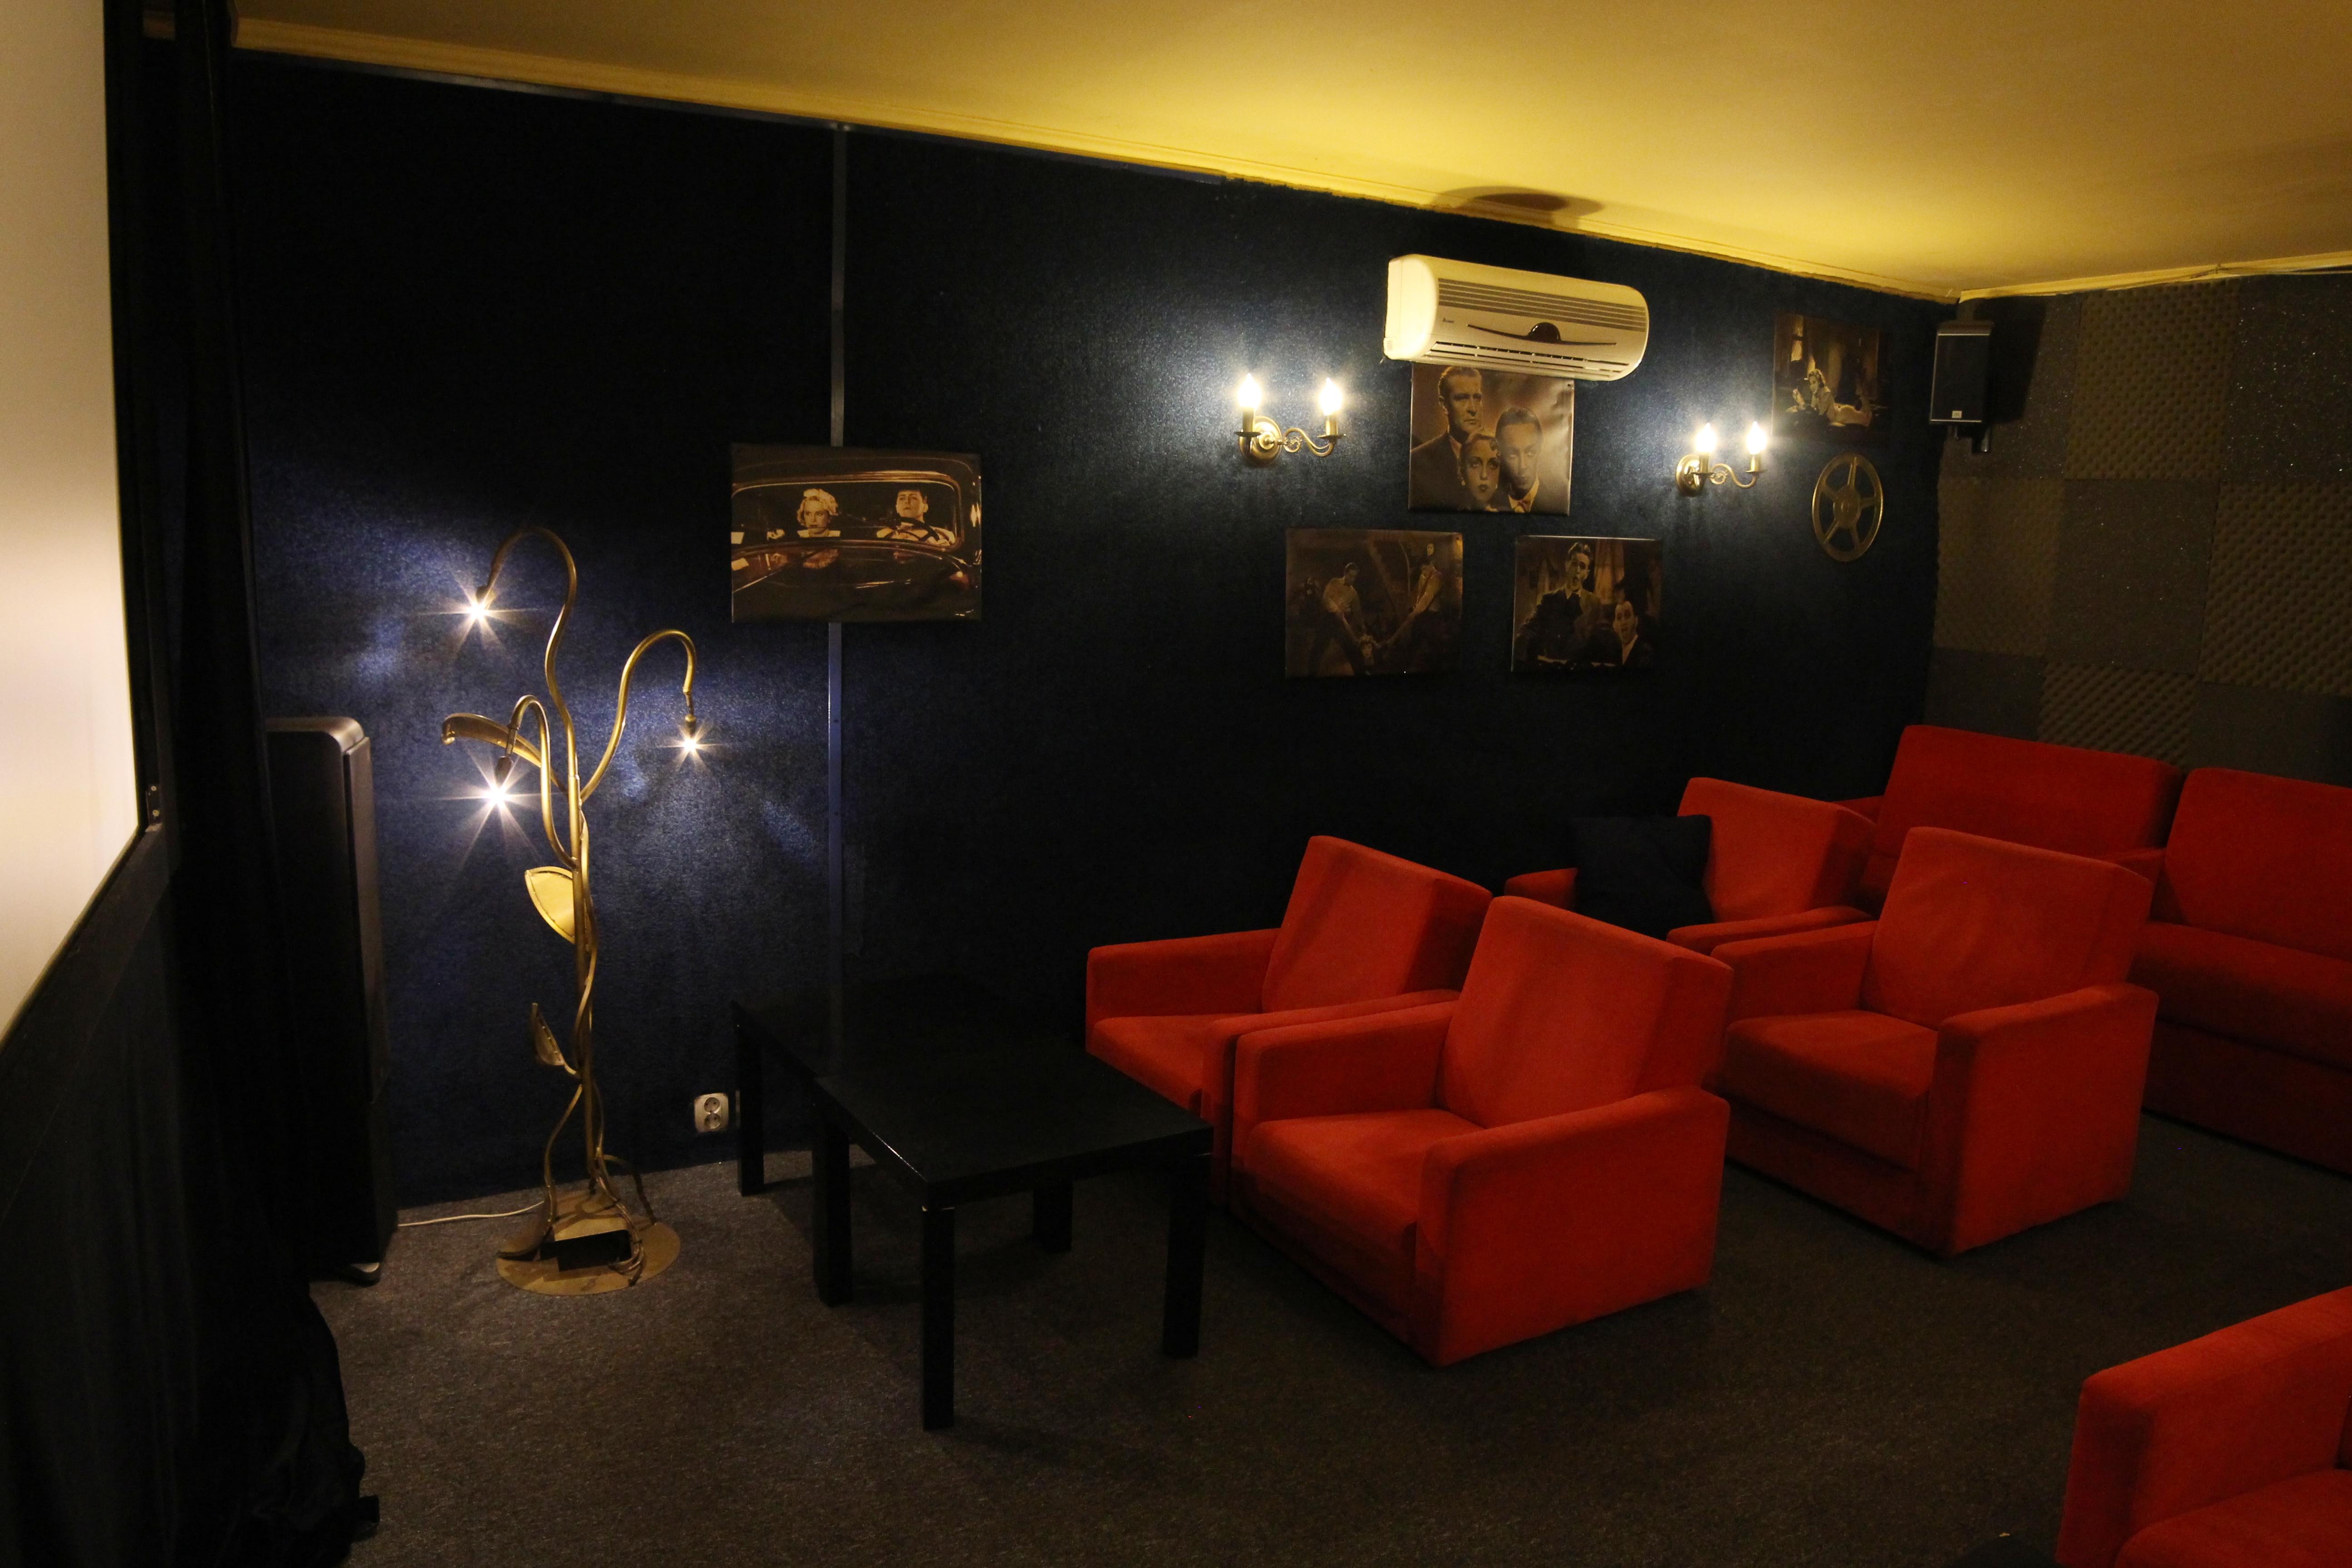 file mikroffala wikimedia commons. Black Bedroom Furniture Sets. Home Design Ideas